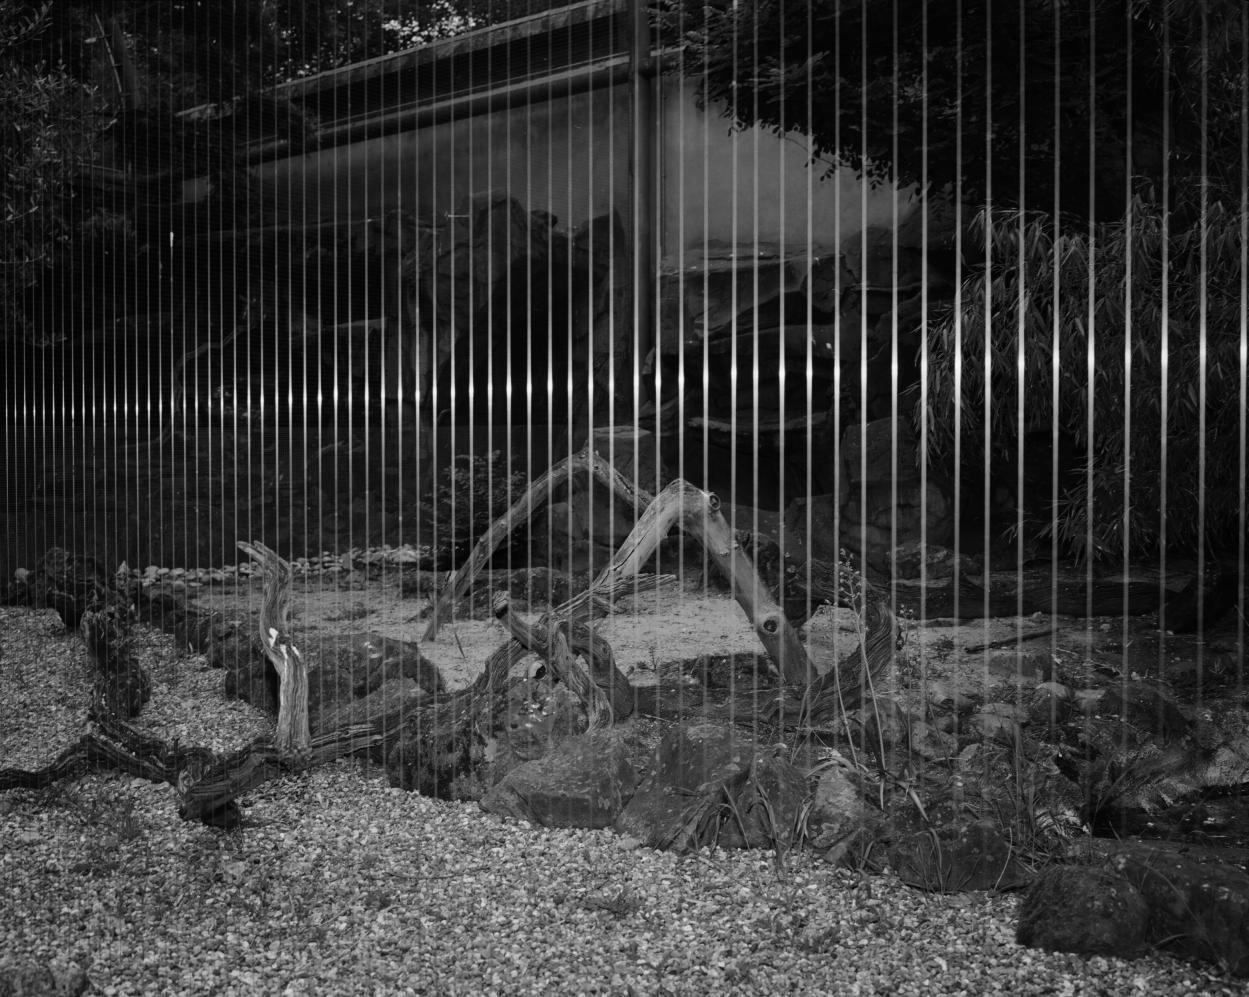 Enclosure XII (2018) - Joanna Piotrowska